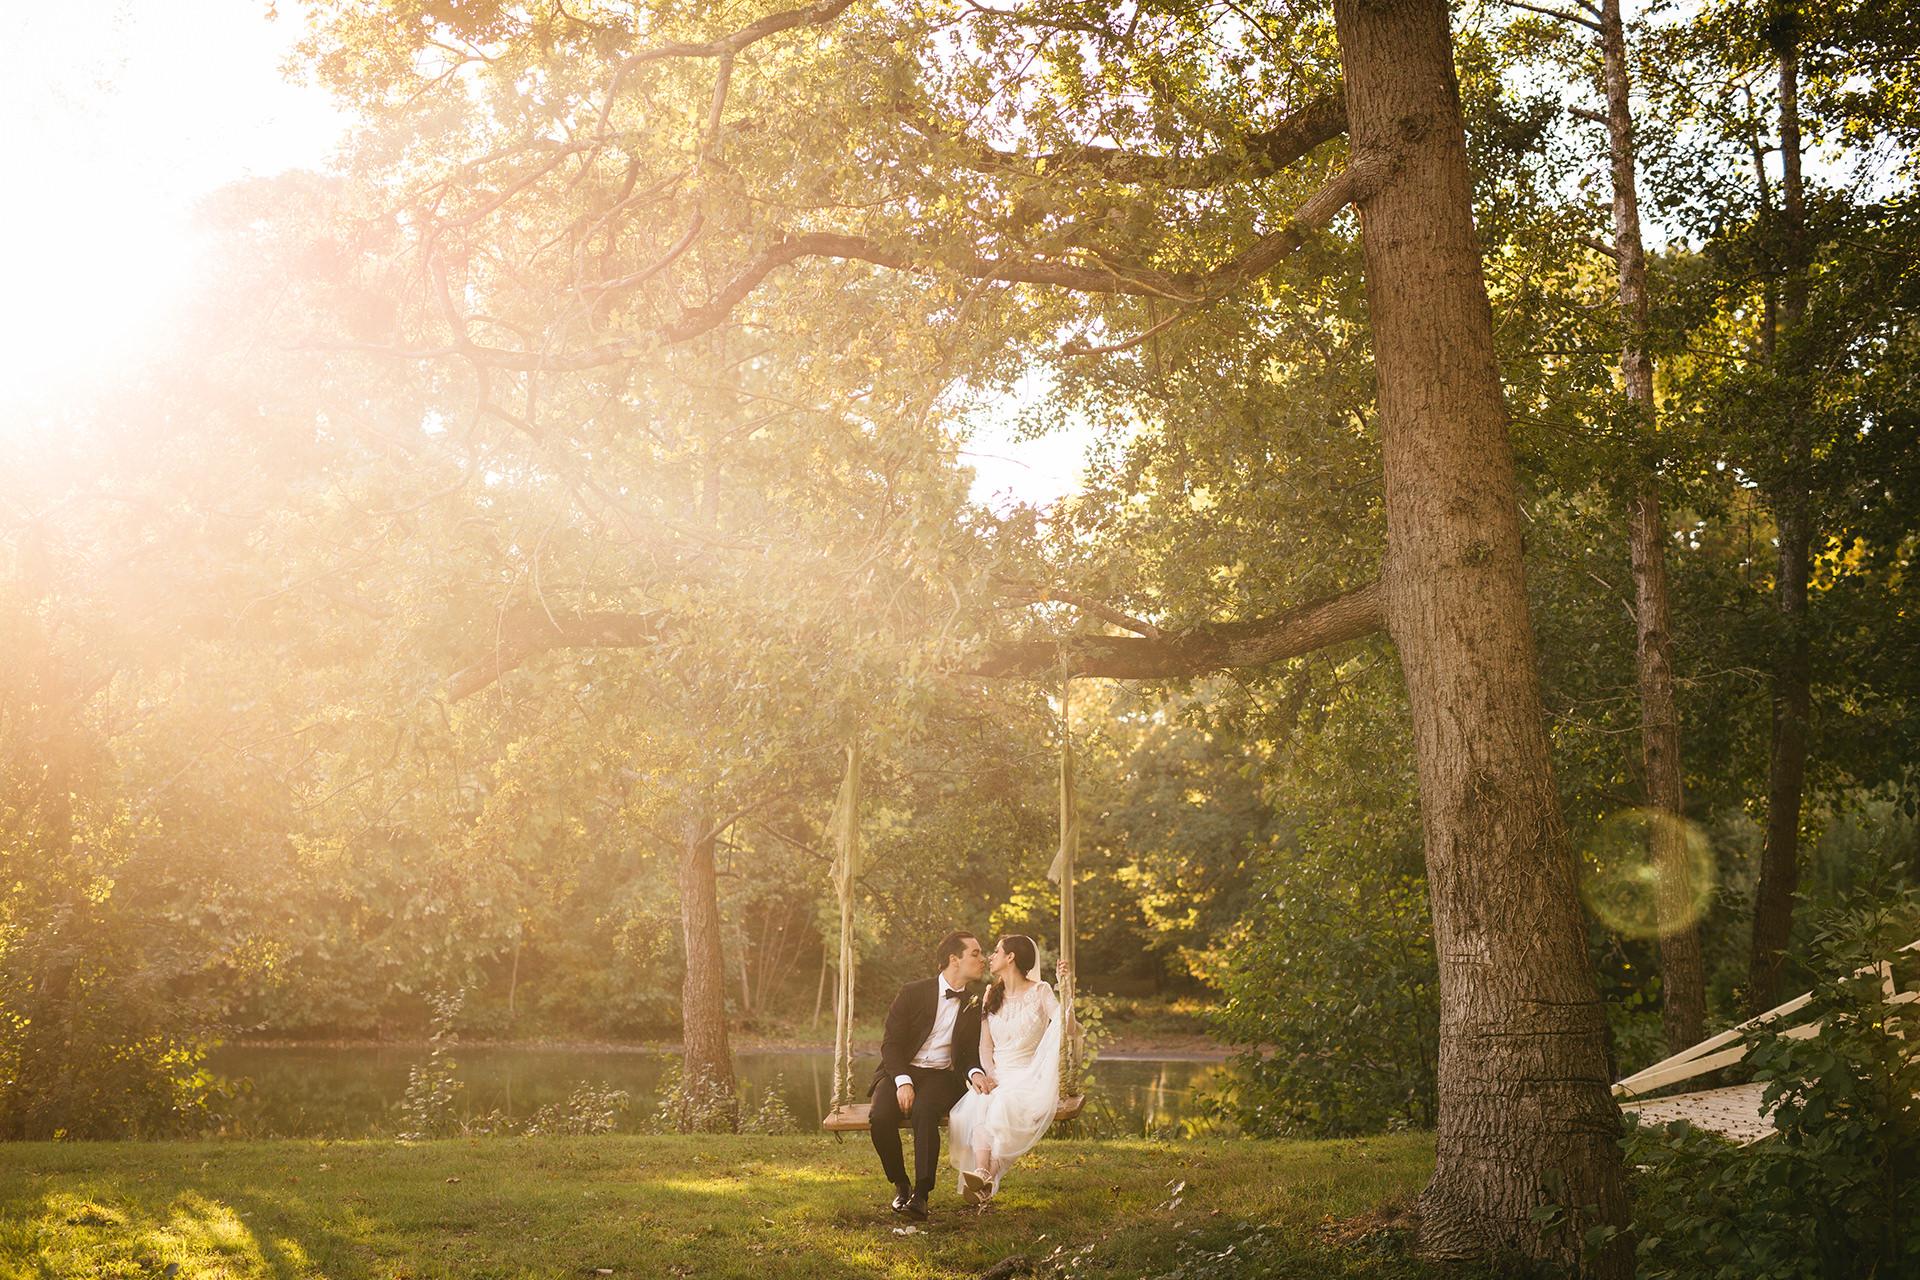 wedding chateau saint georges grasse - zephyr and luna